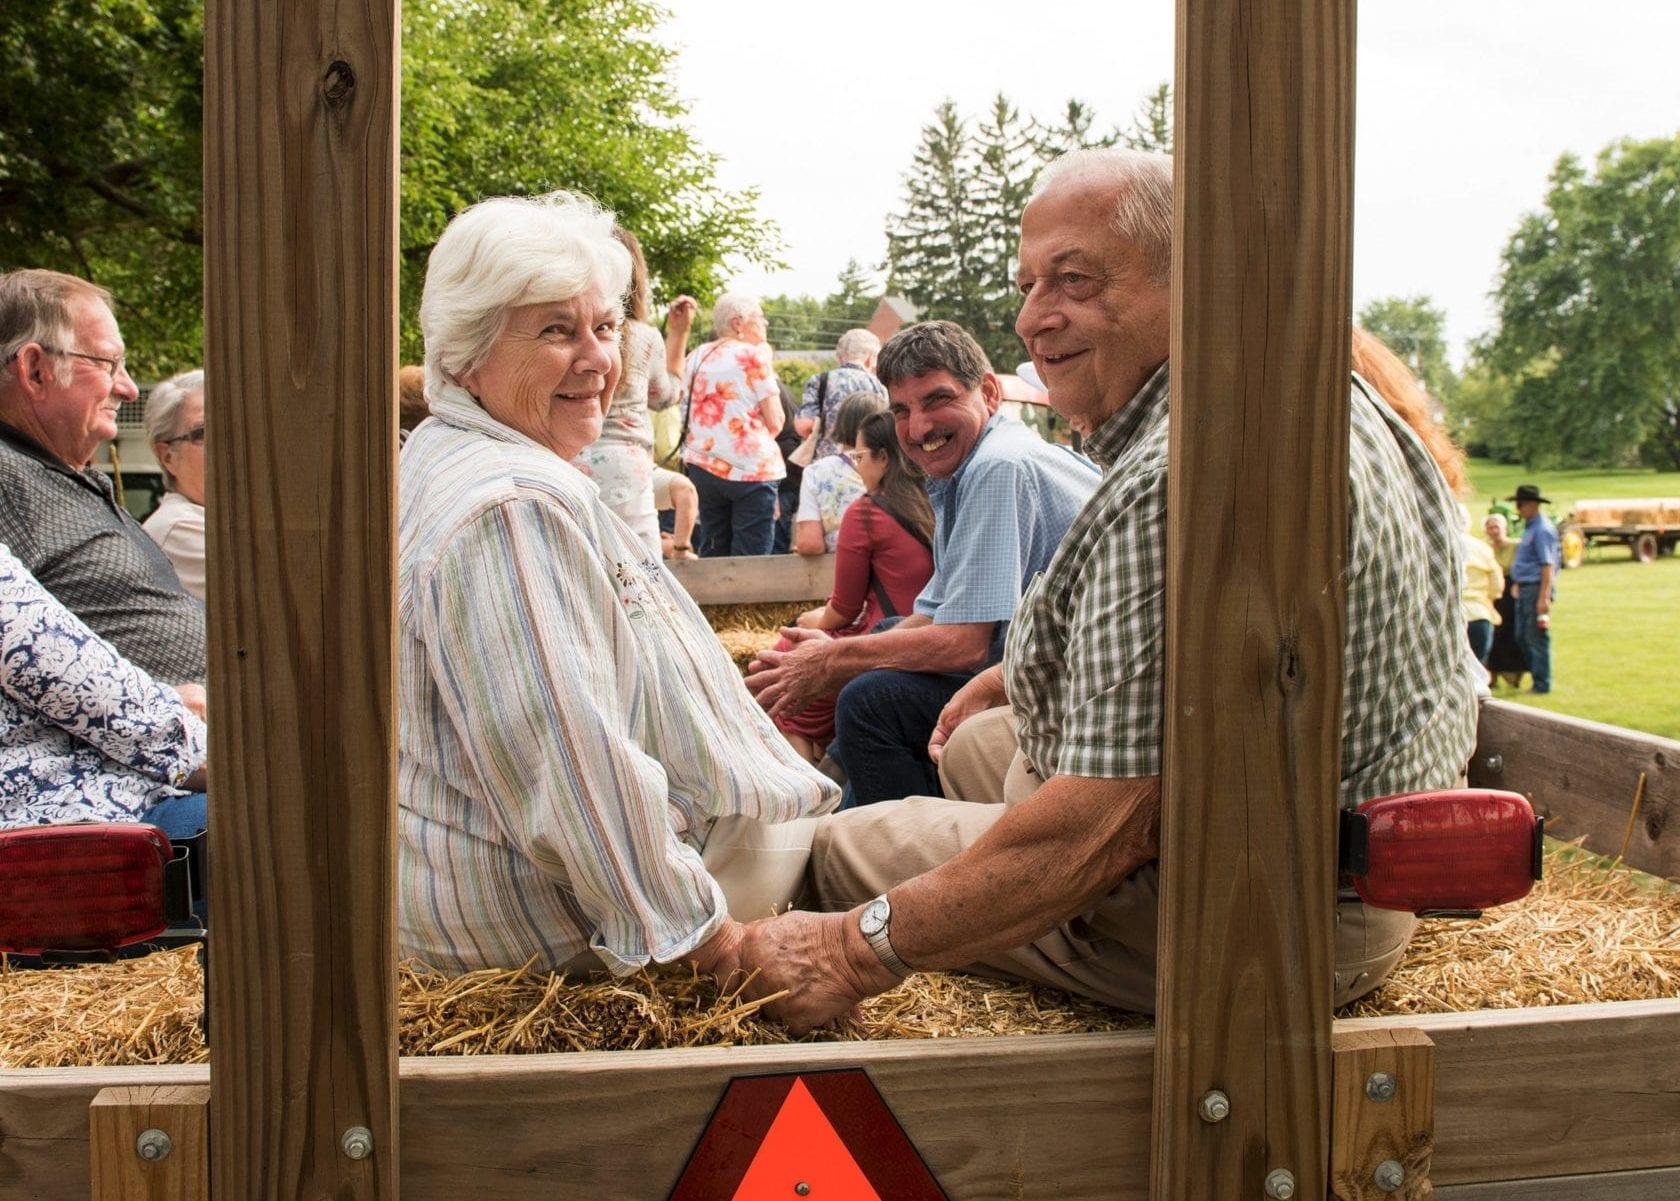 Couple on cornfield banquet hayride in Bird-in-Hand